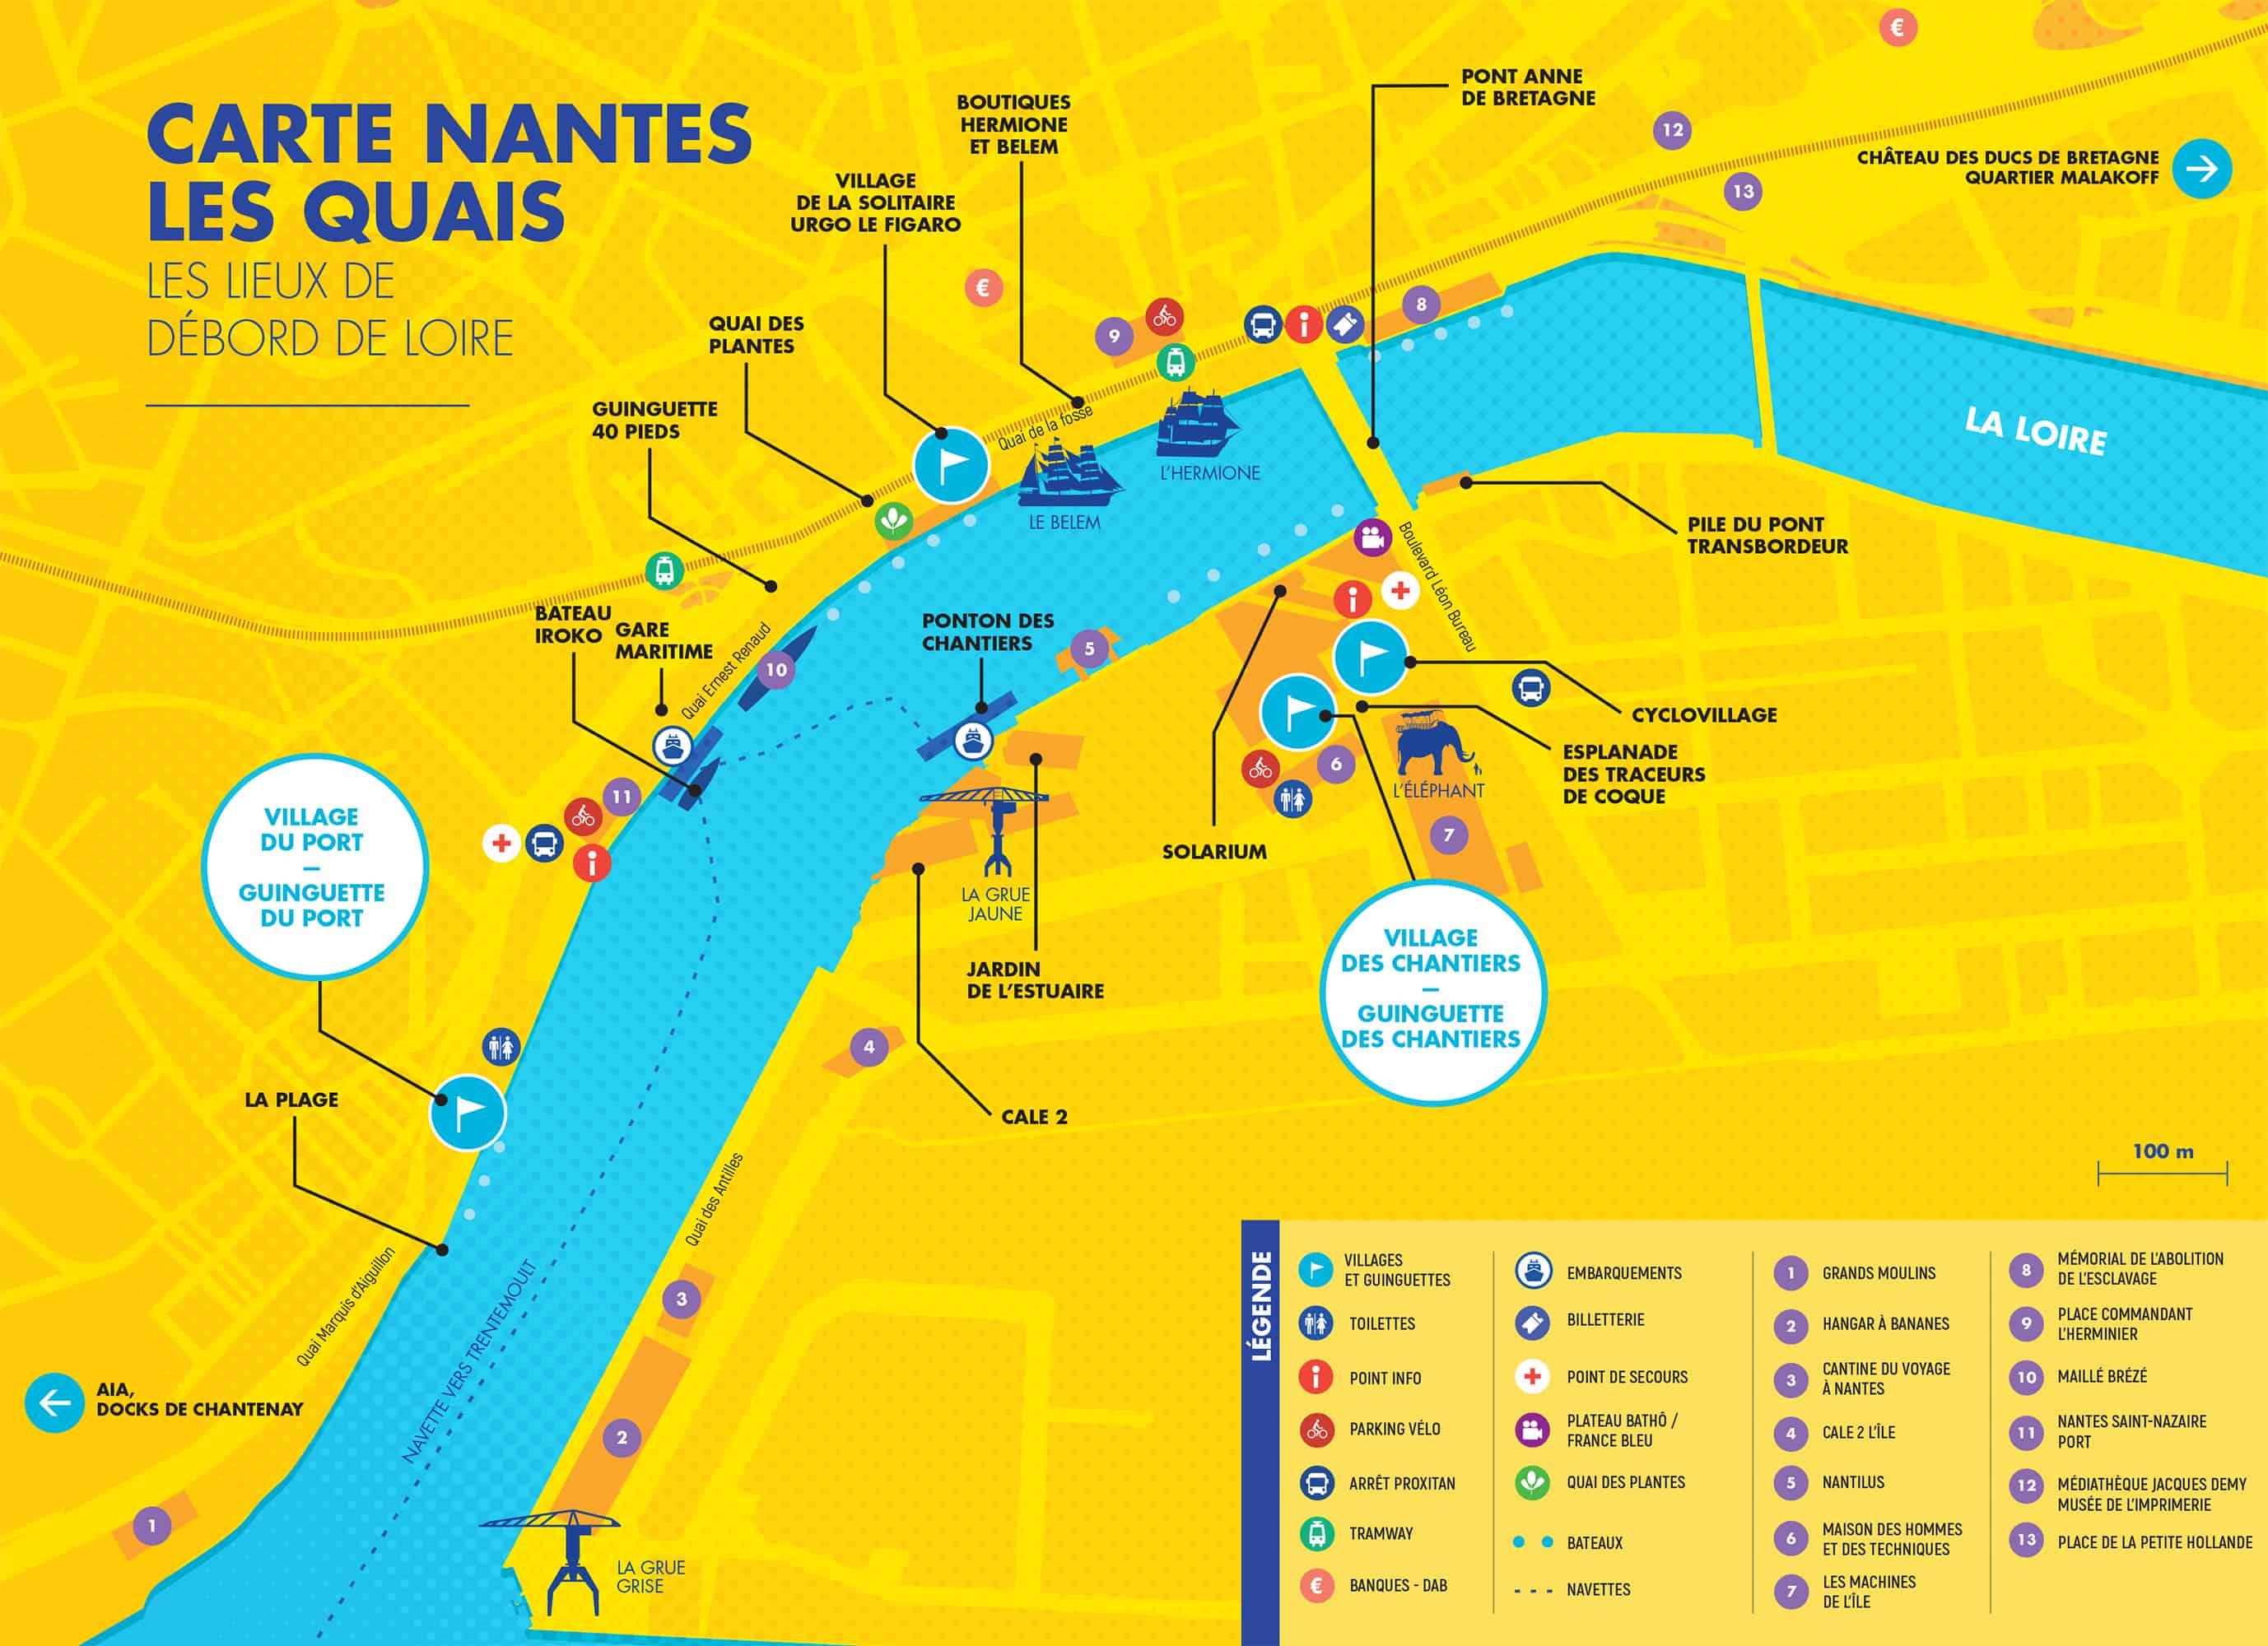 Pratique A Nantes Debord De Loire